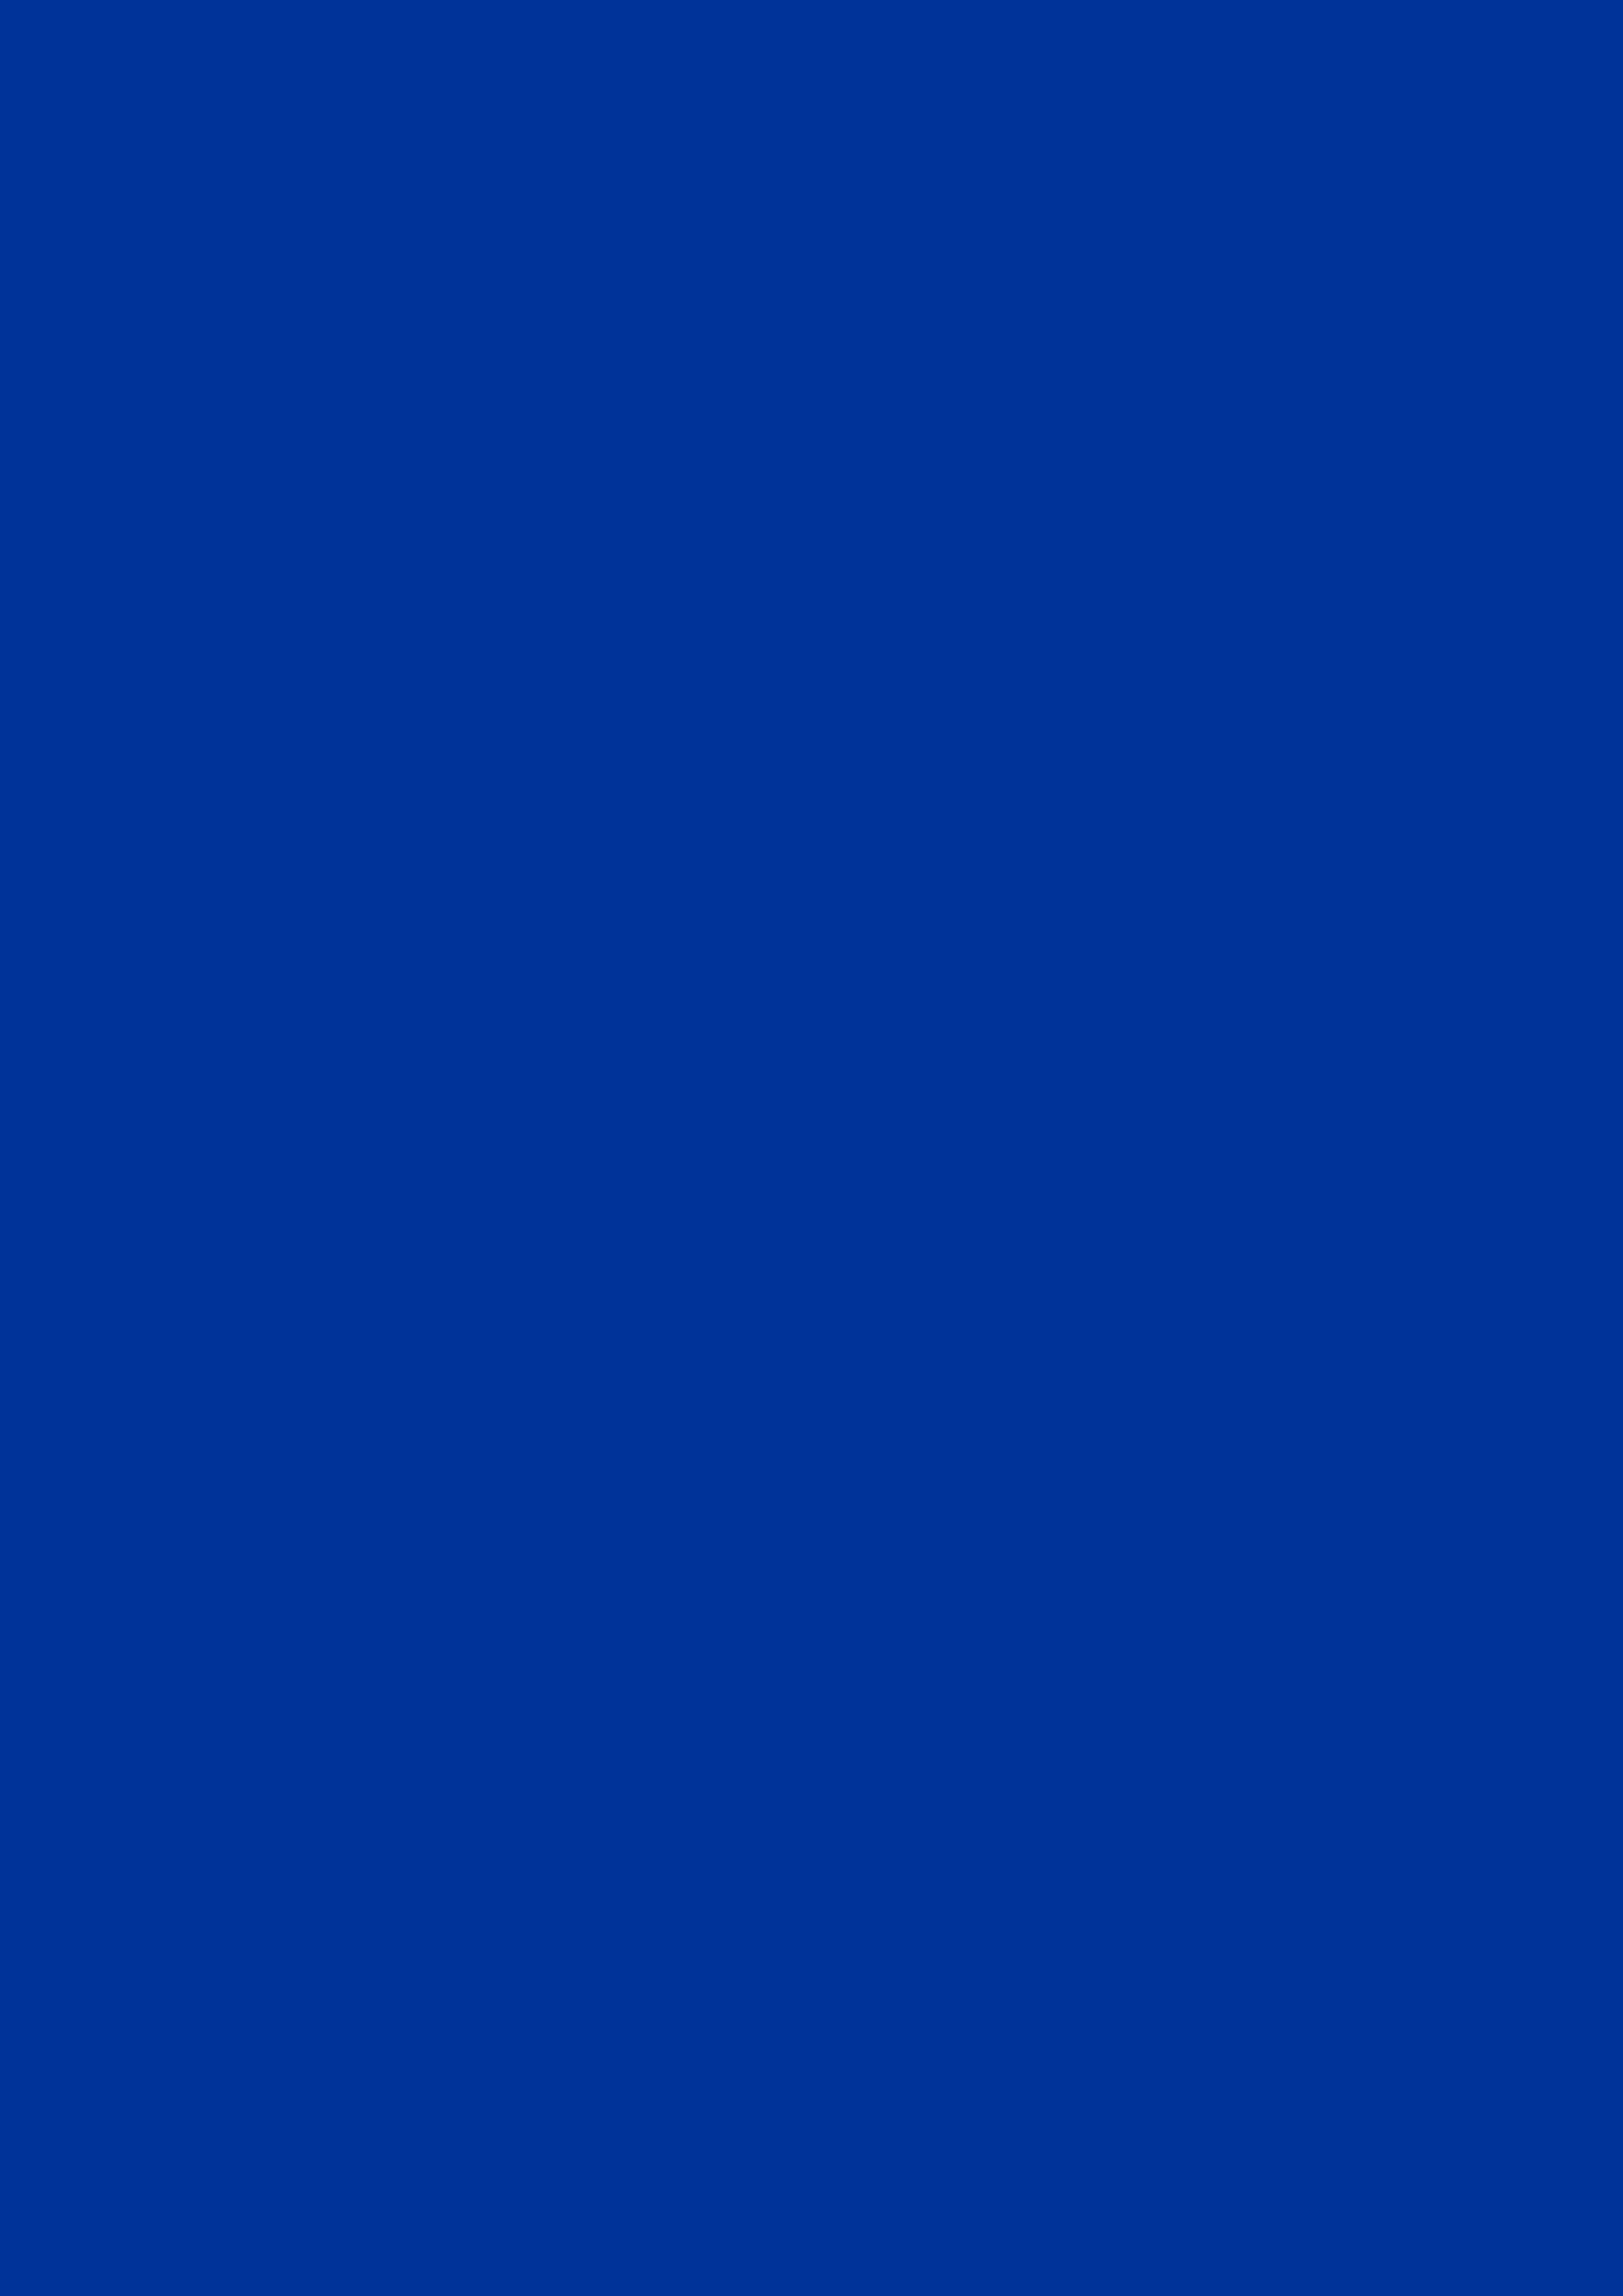 2480x3508 Smalt Dark Powder Blue Solid Color Background